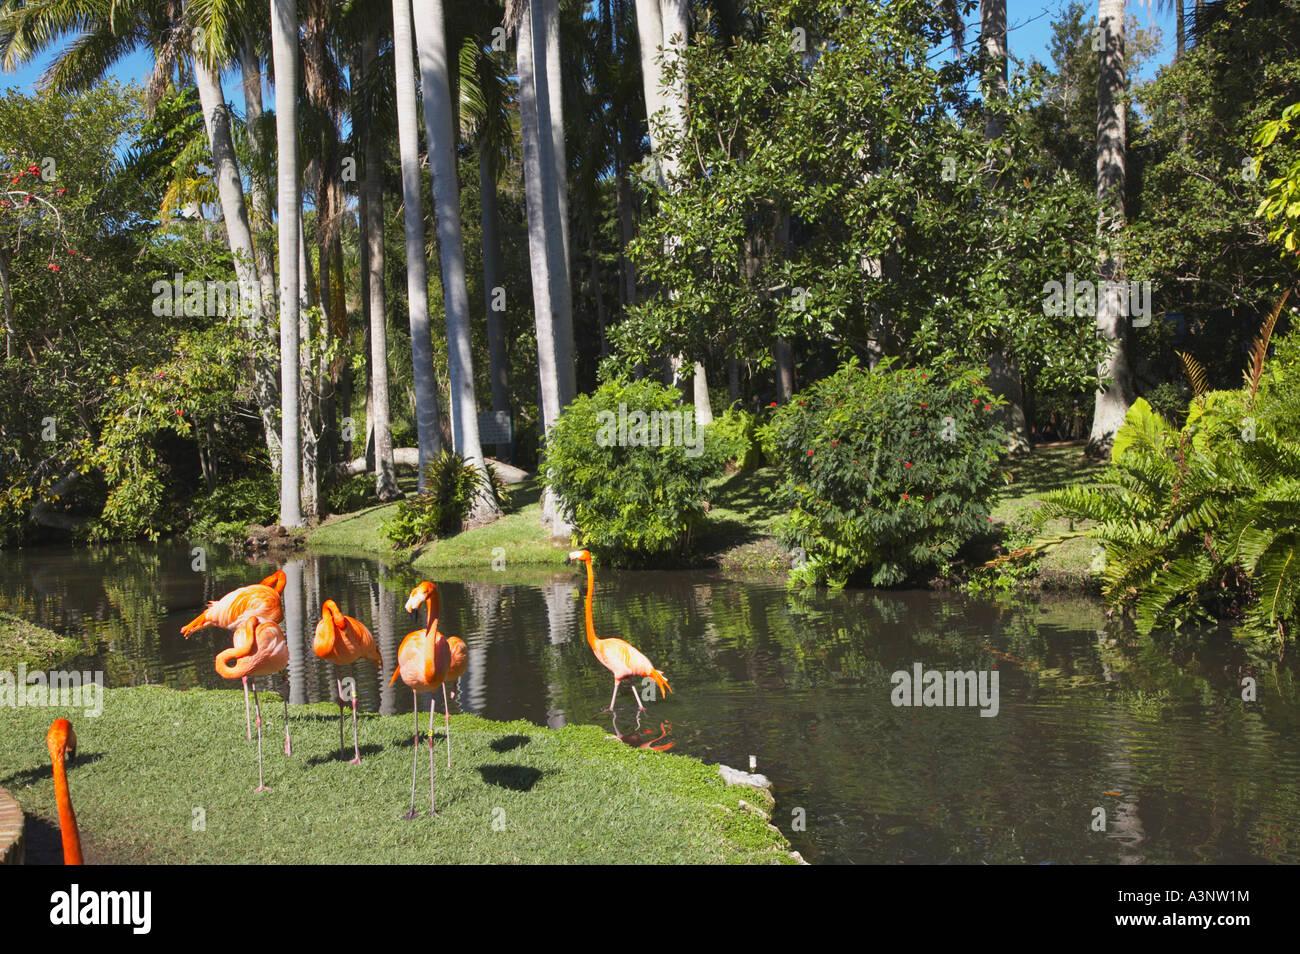 Florida Sarasota Jungle Gardens Flamingos Stock Photos Florida Sarasota Jungle Gardens